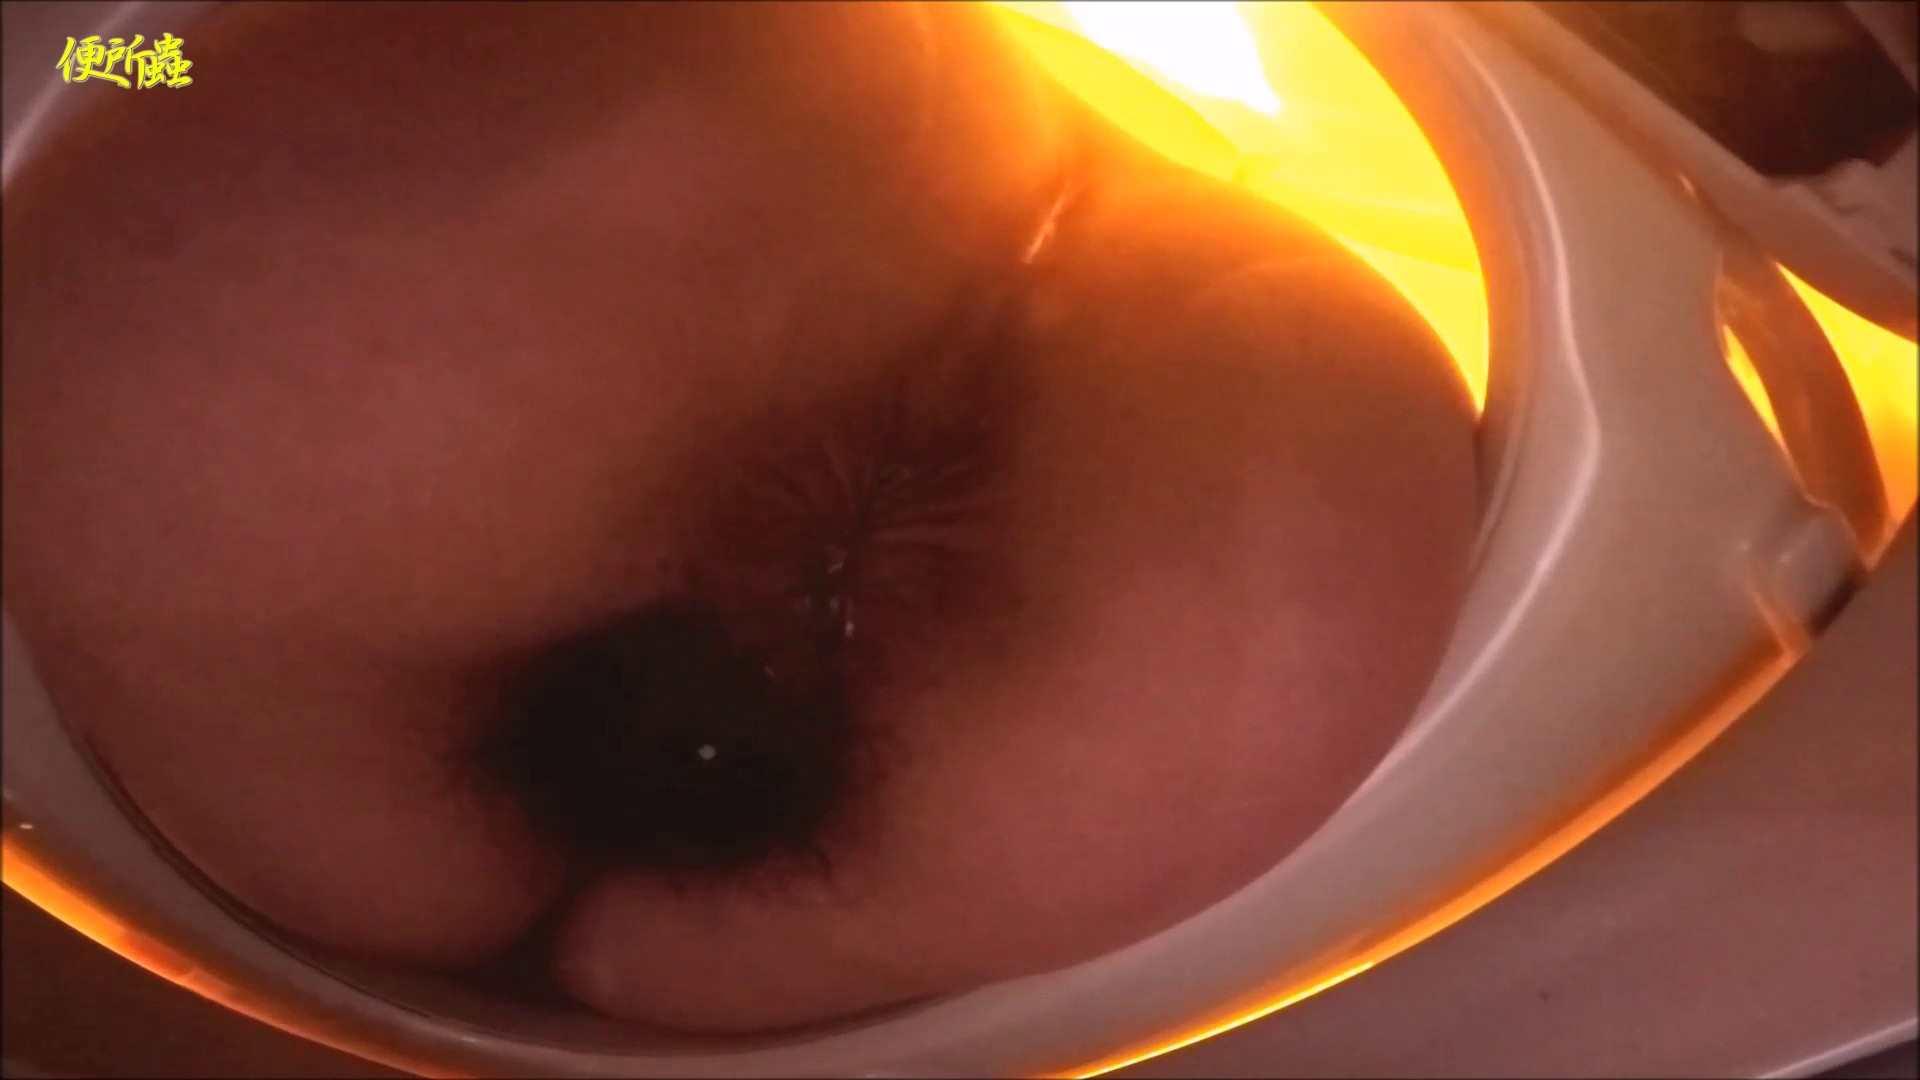 vol.08 便所蟲さんのリターン~寺子屋洗面所盗撮~ 高画質動画  72画像 8